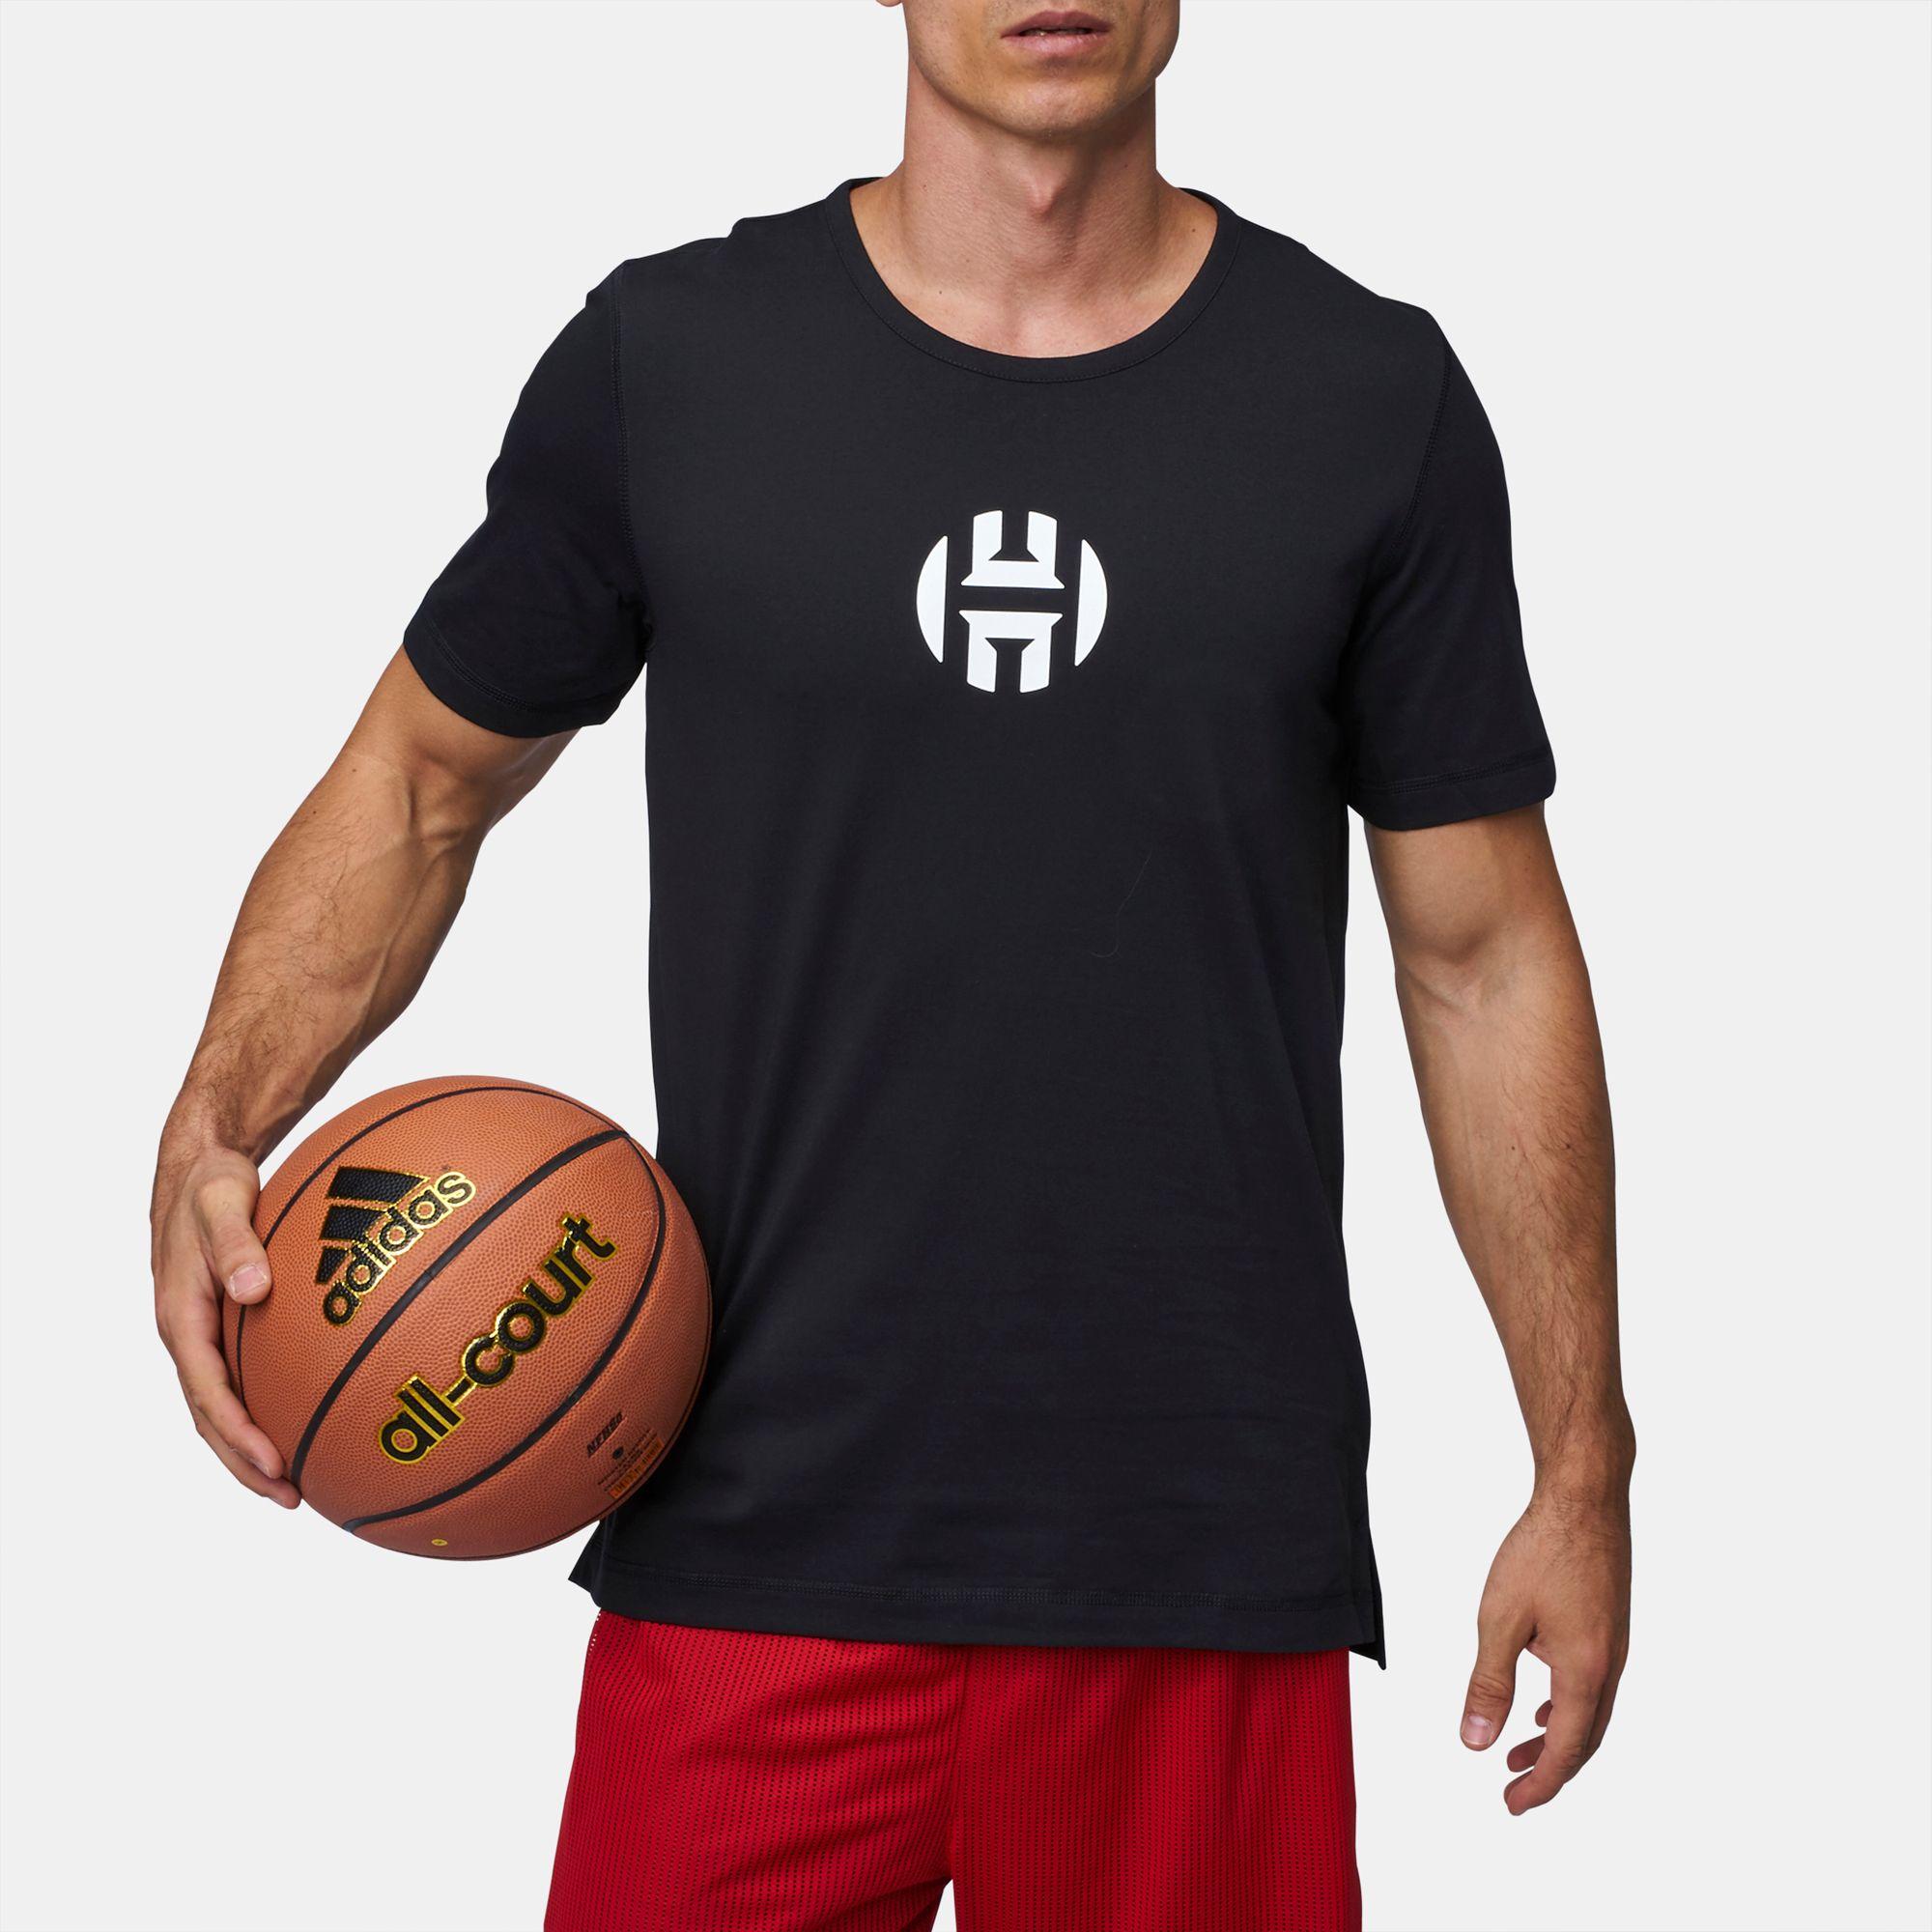 low priced 8bad3 464eb adidas Harden Logo T-Shirt | T-Shirts | Tops | Clothing ...